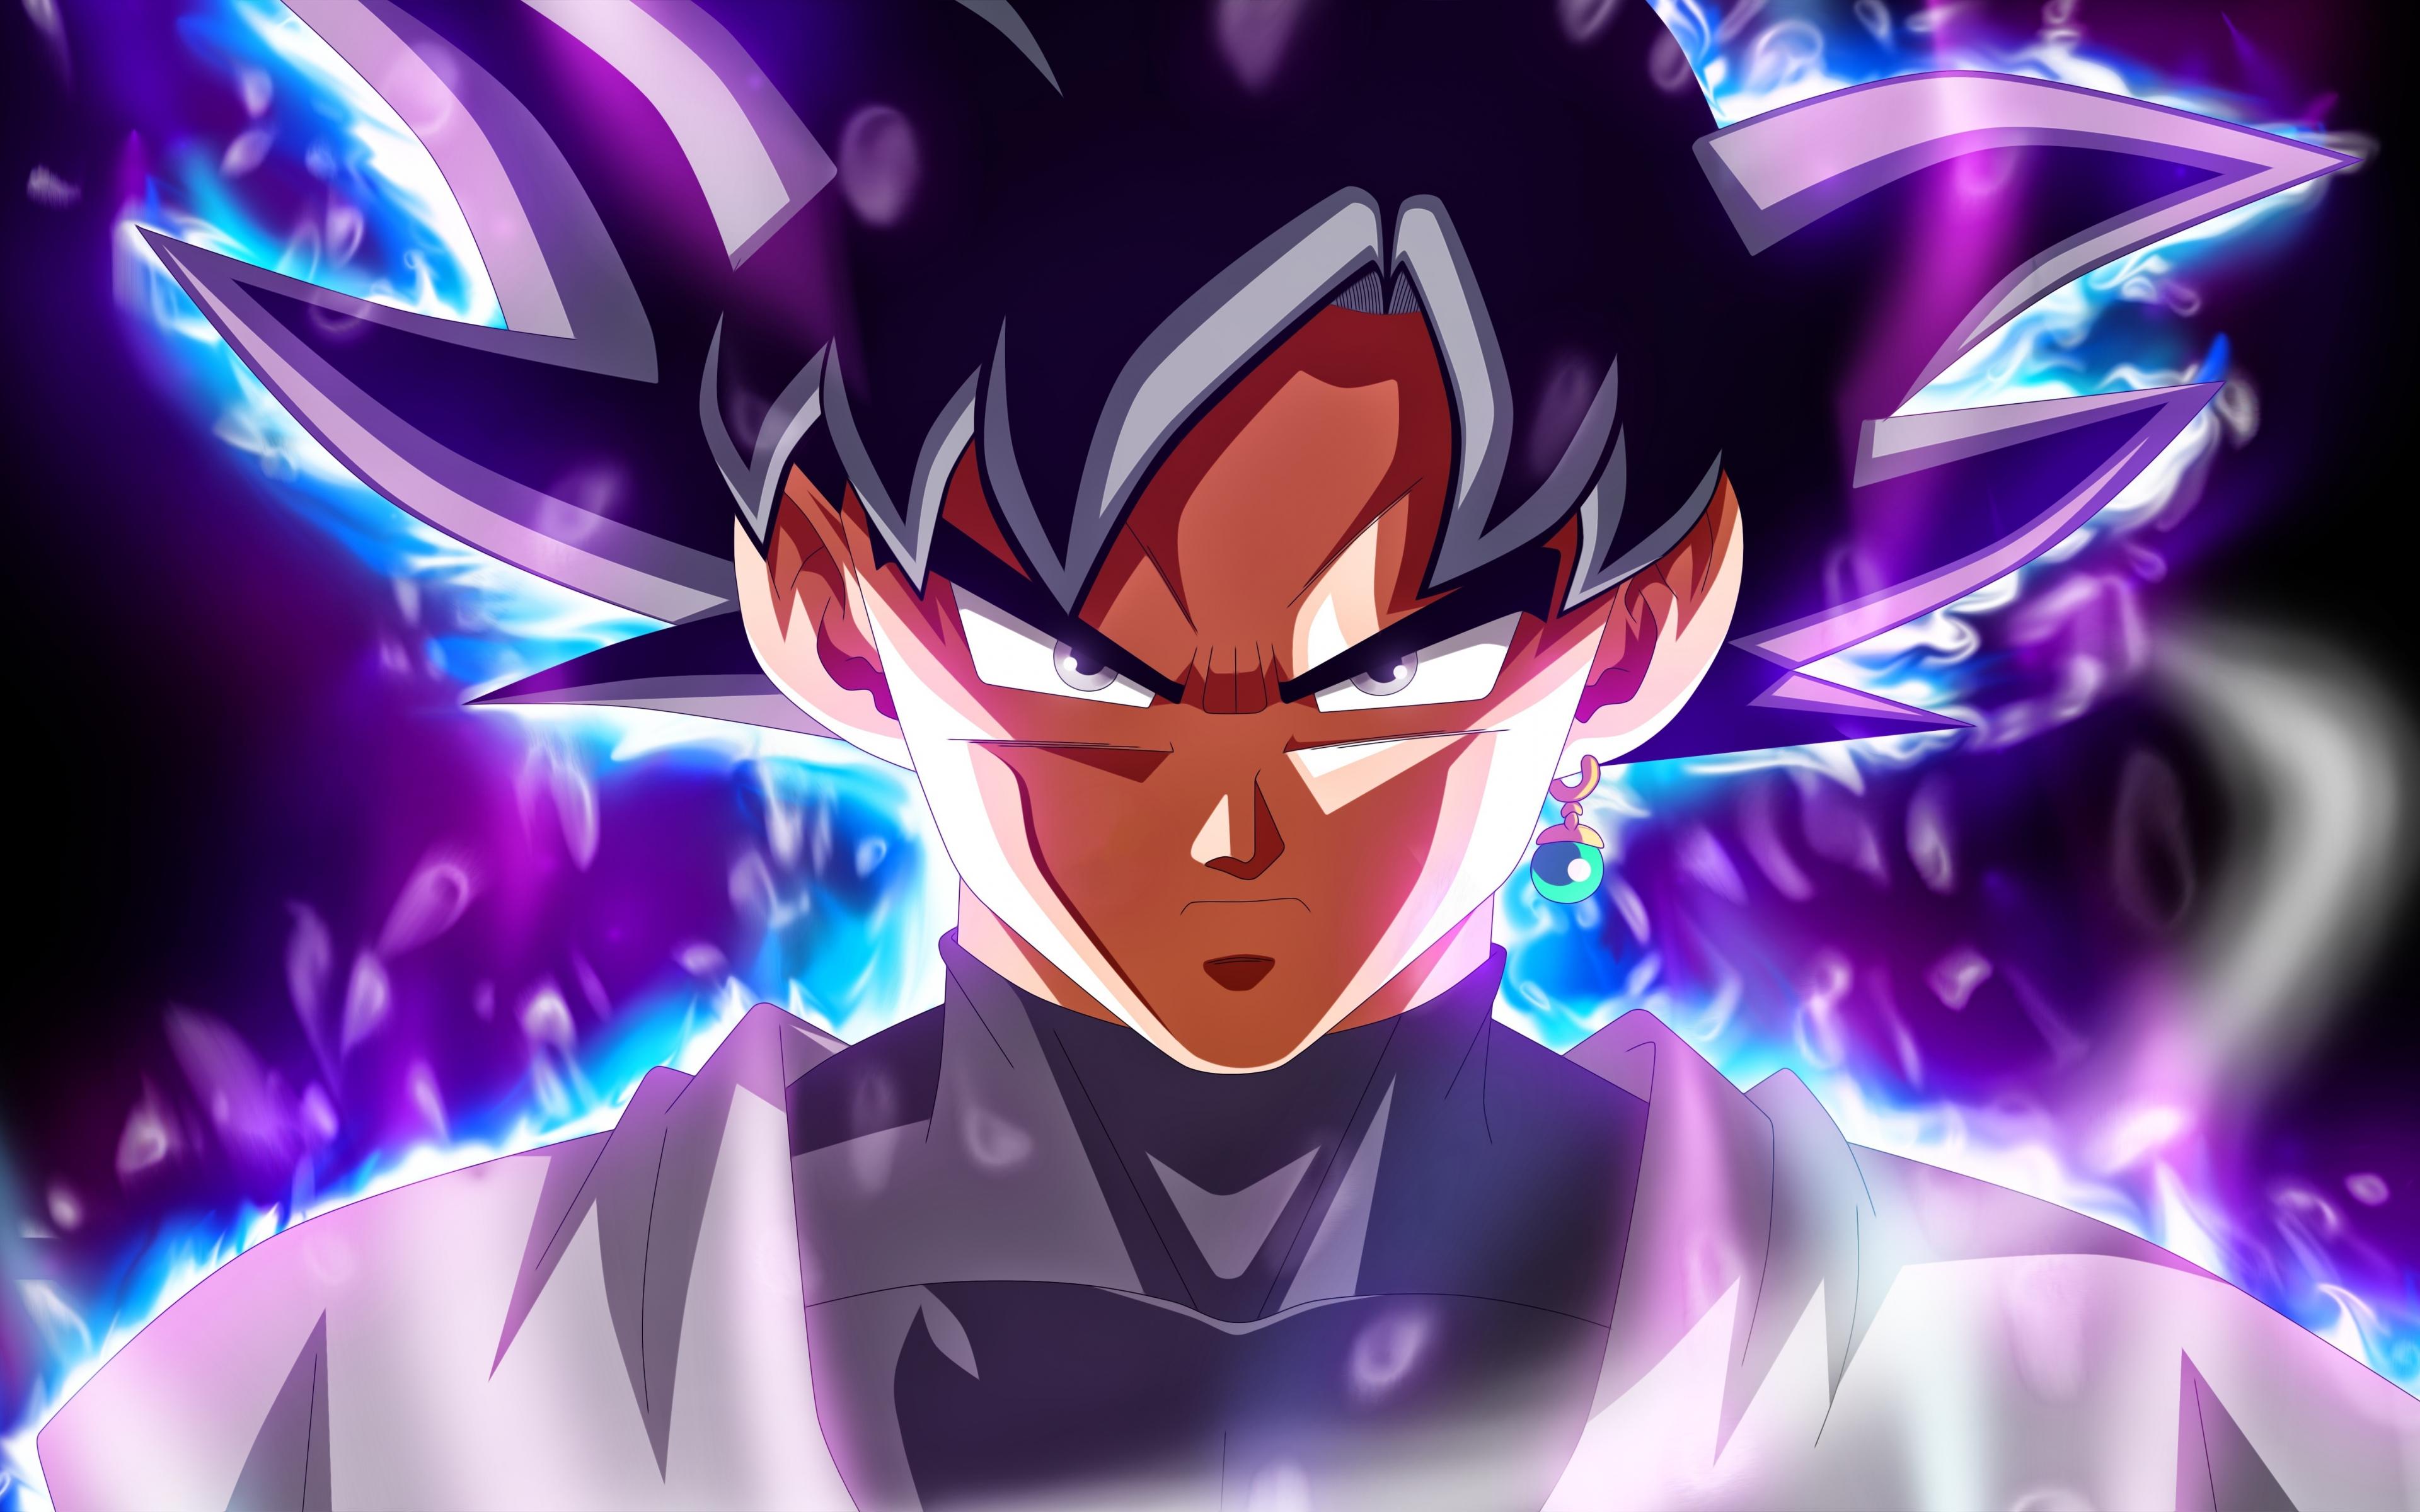 Ultra Instinct Goku Wallpaper 4k: Download 3840x2400 Wallpaper Ultra Instinct, Dragon Ball